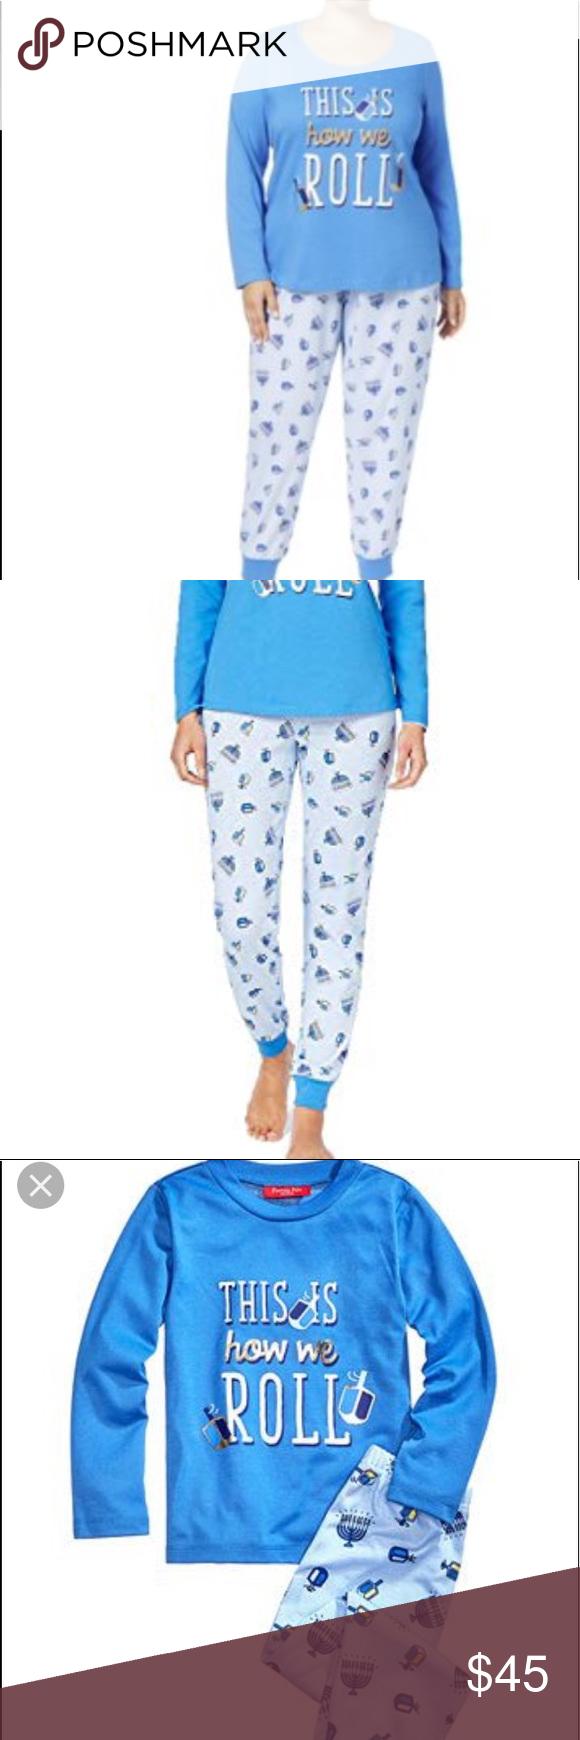 13 PhotoWorthy Matching Disney Pajamas for Christmas 2020